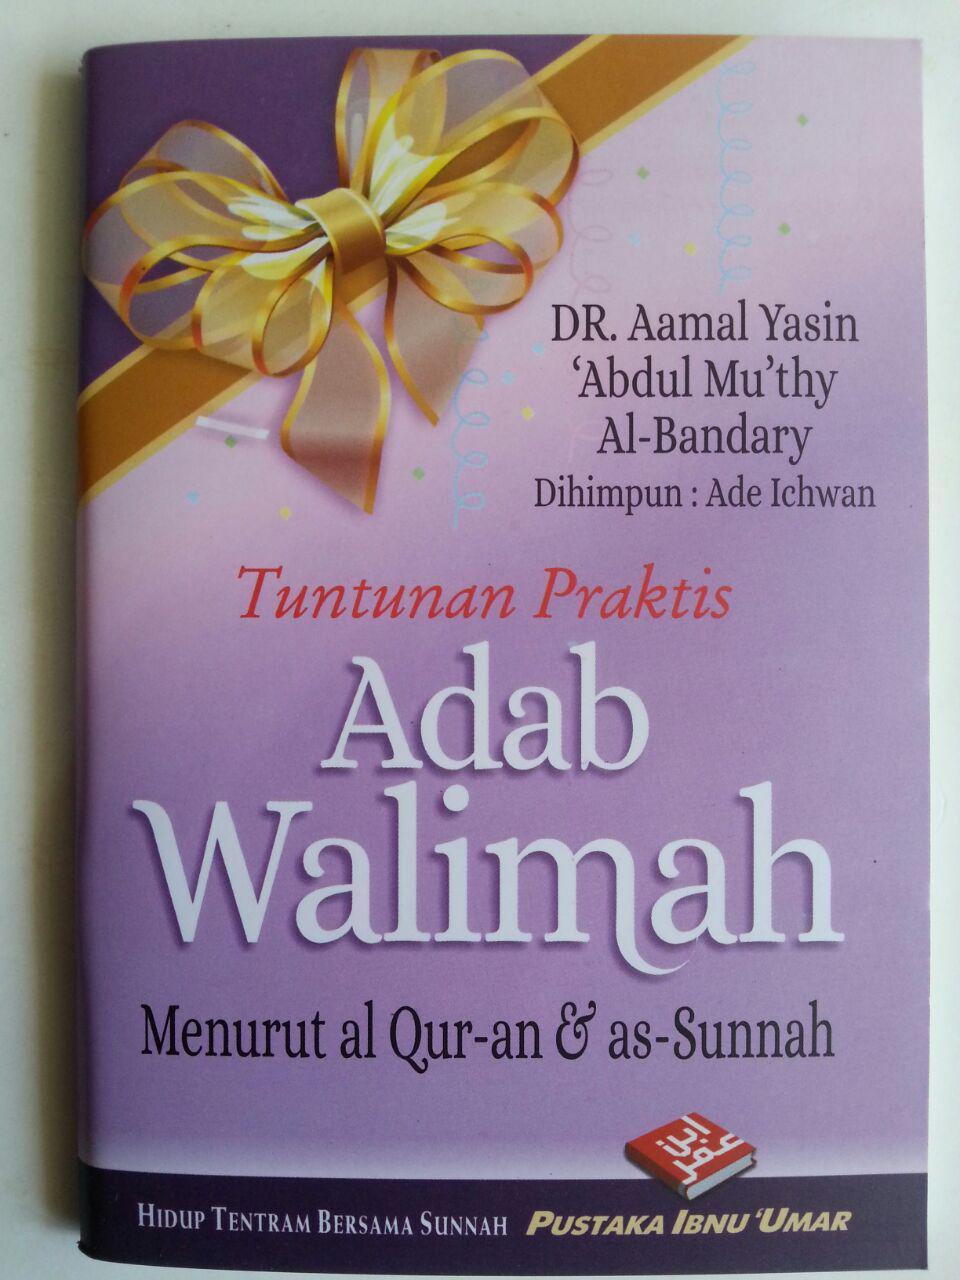 Buku Saku Tuntunan Praktis Adab Walimah Menurut Qur'an Dan Sunnah cover 2